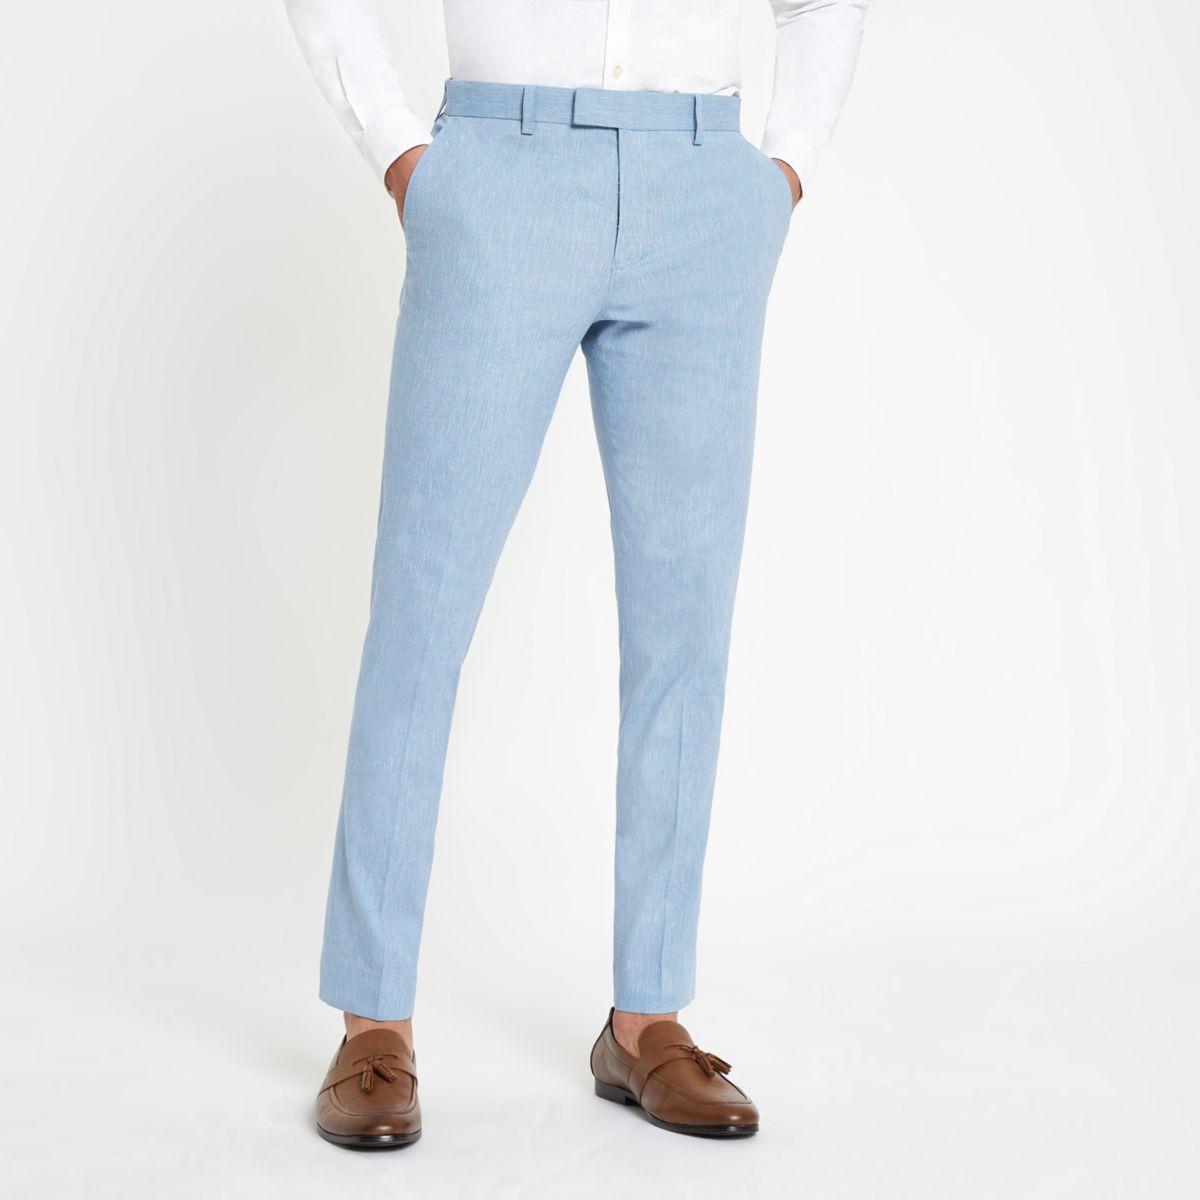 Light blue skinny suit pants with linen